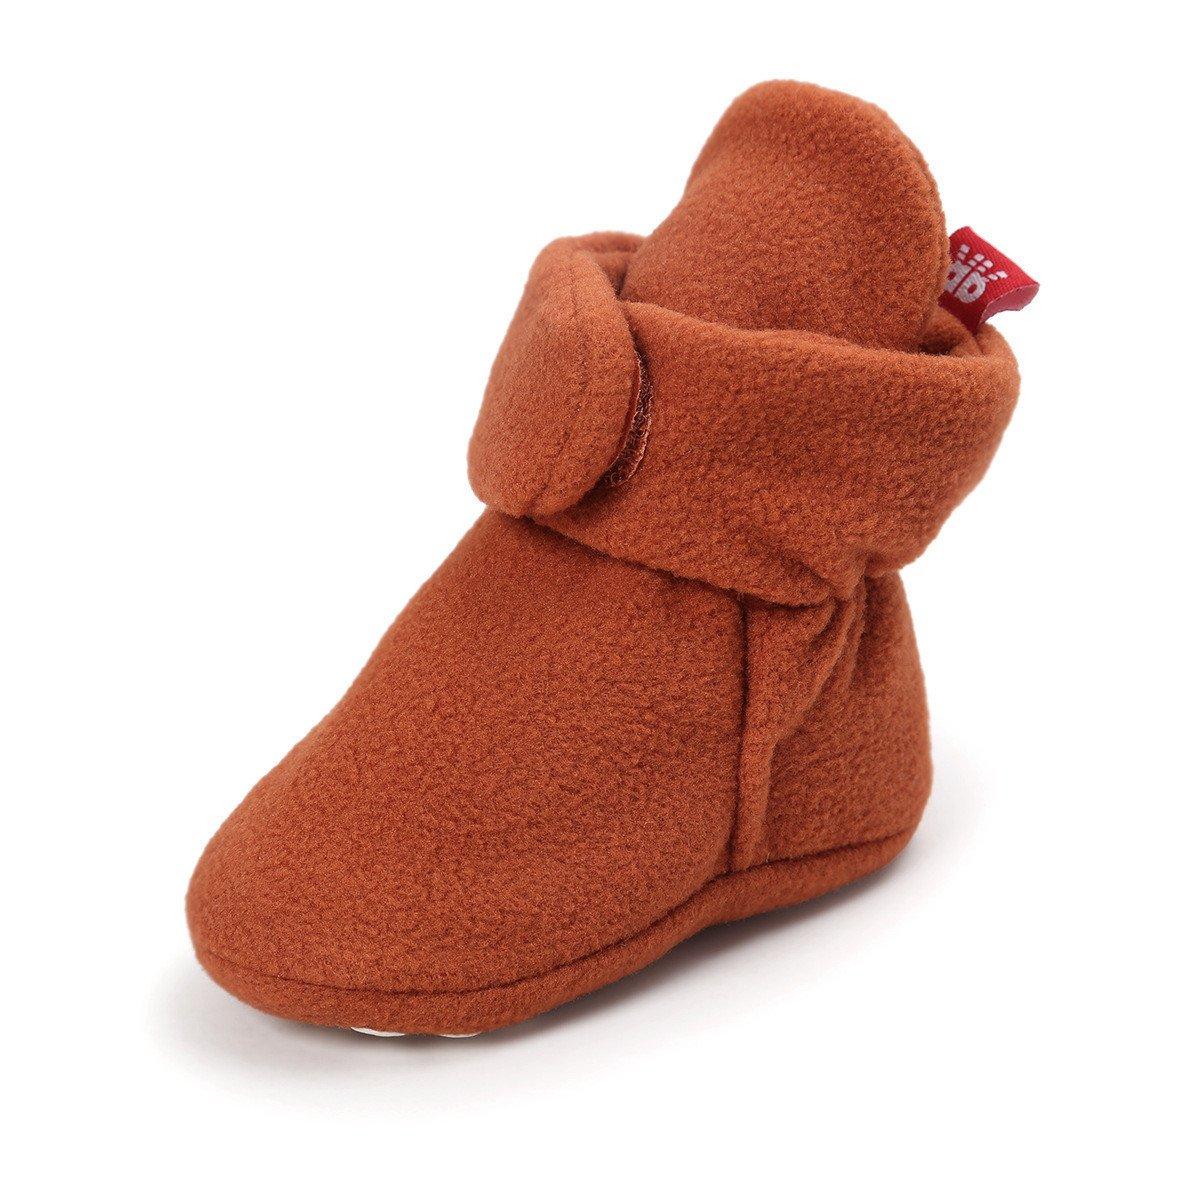 E-FAK Baby Cozy Fleece Booties Non Skid Bottom Newborn Infant Crib Shoes Snow Boots